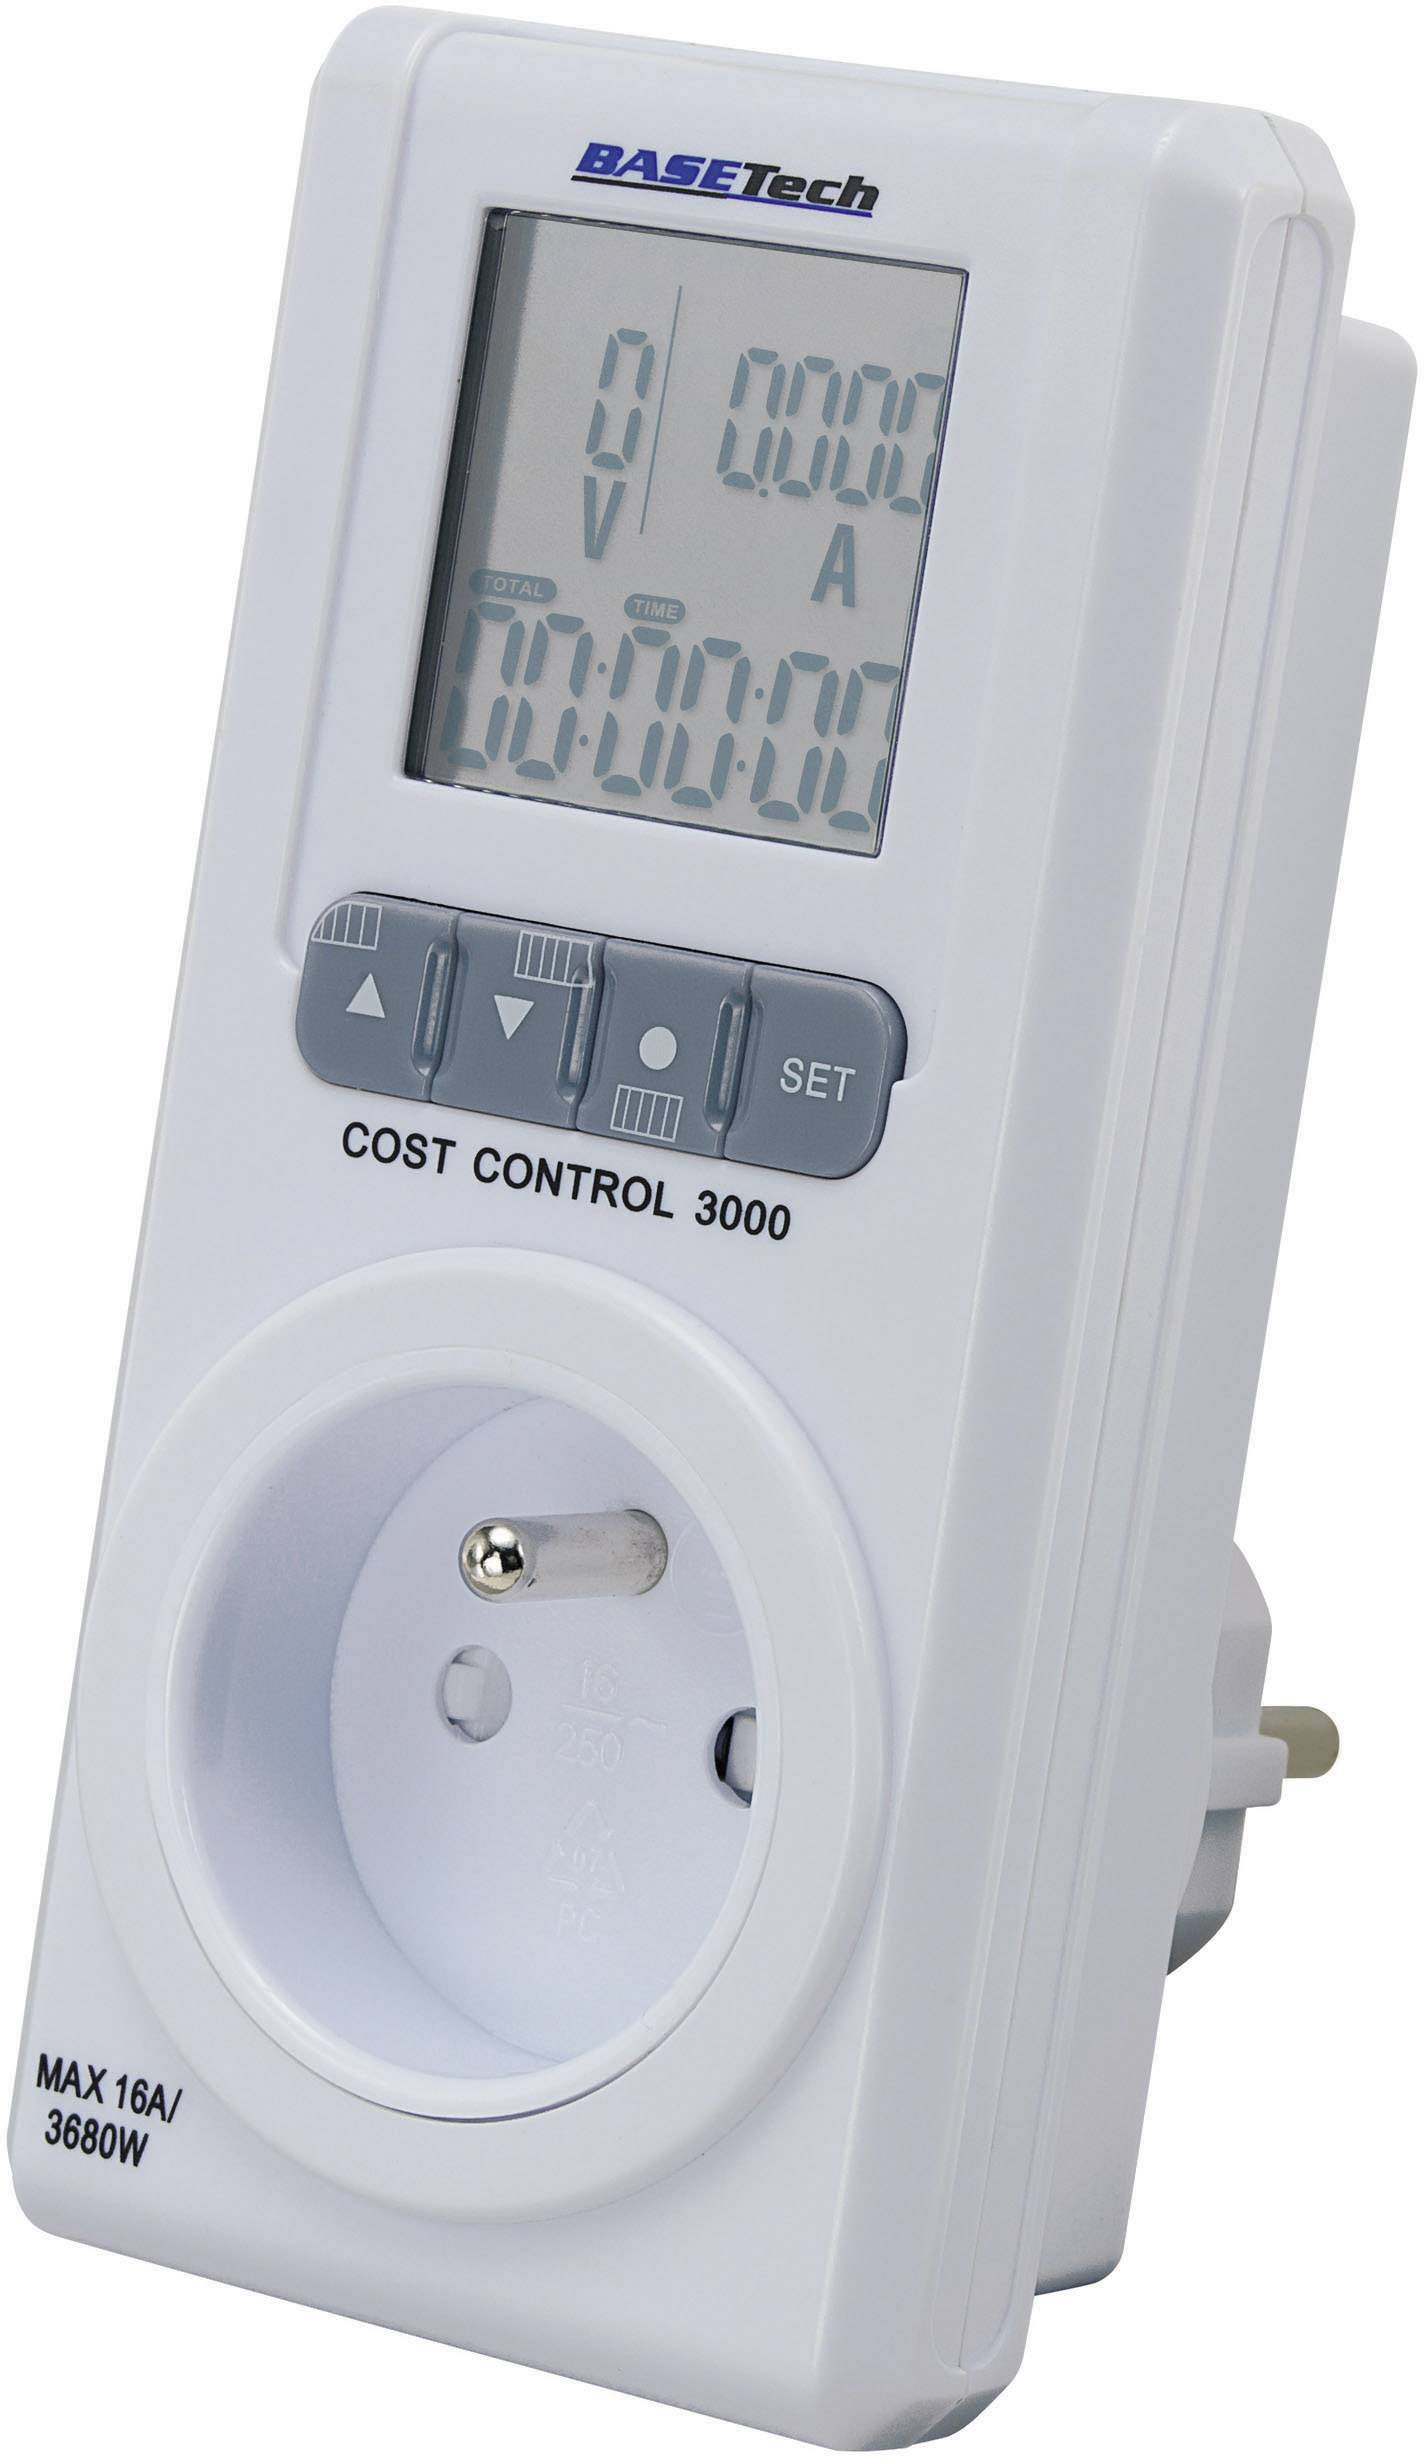 Merač spotreby BaseTech Cost Control 3000 CZ